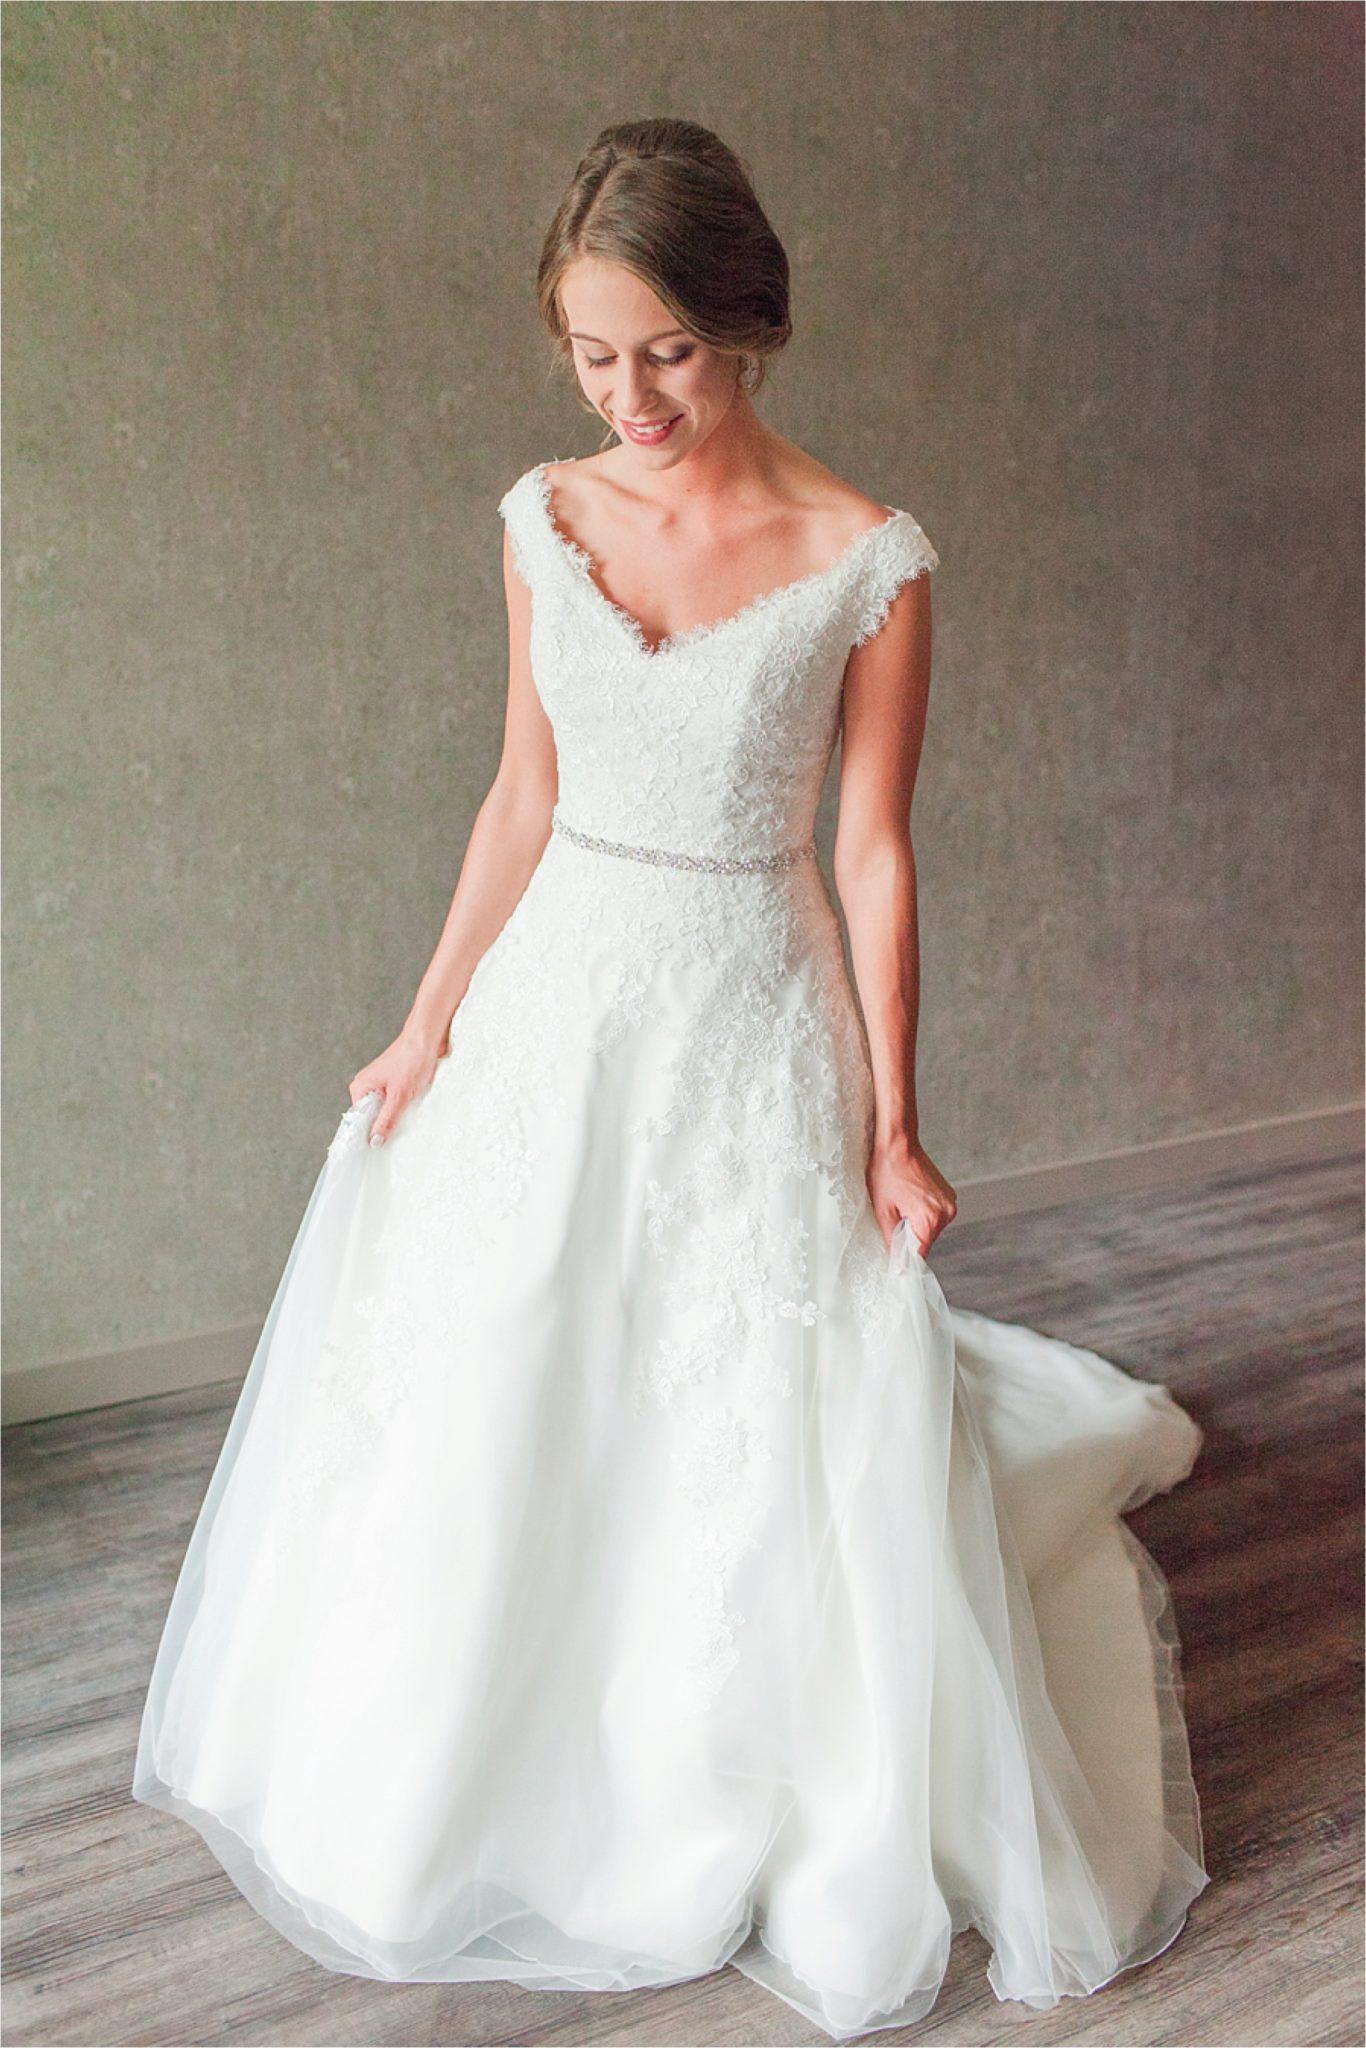 Kananaskis Canada Wedding at the Delta Lodge-Kaitlin & Ricky-Alabama wedding photographer-Lodge wedding-Bride-Bridal photography-Wedding dress inspiration